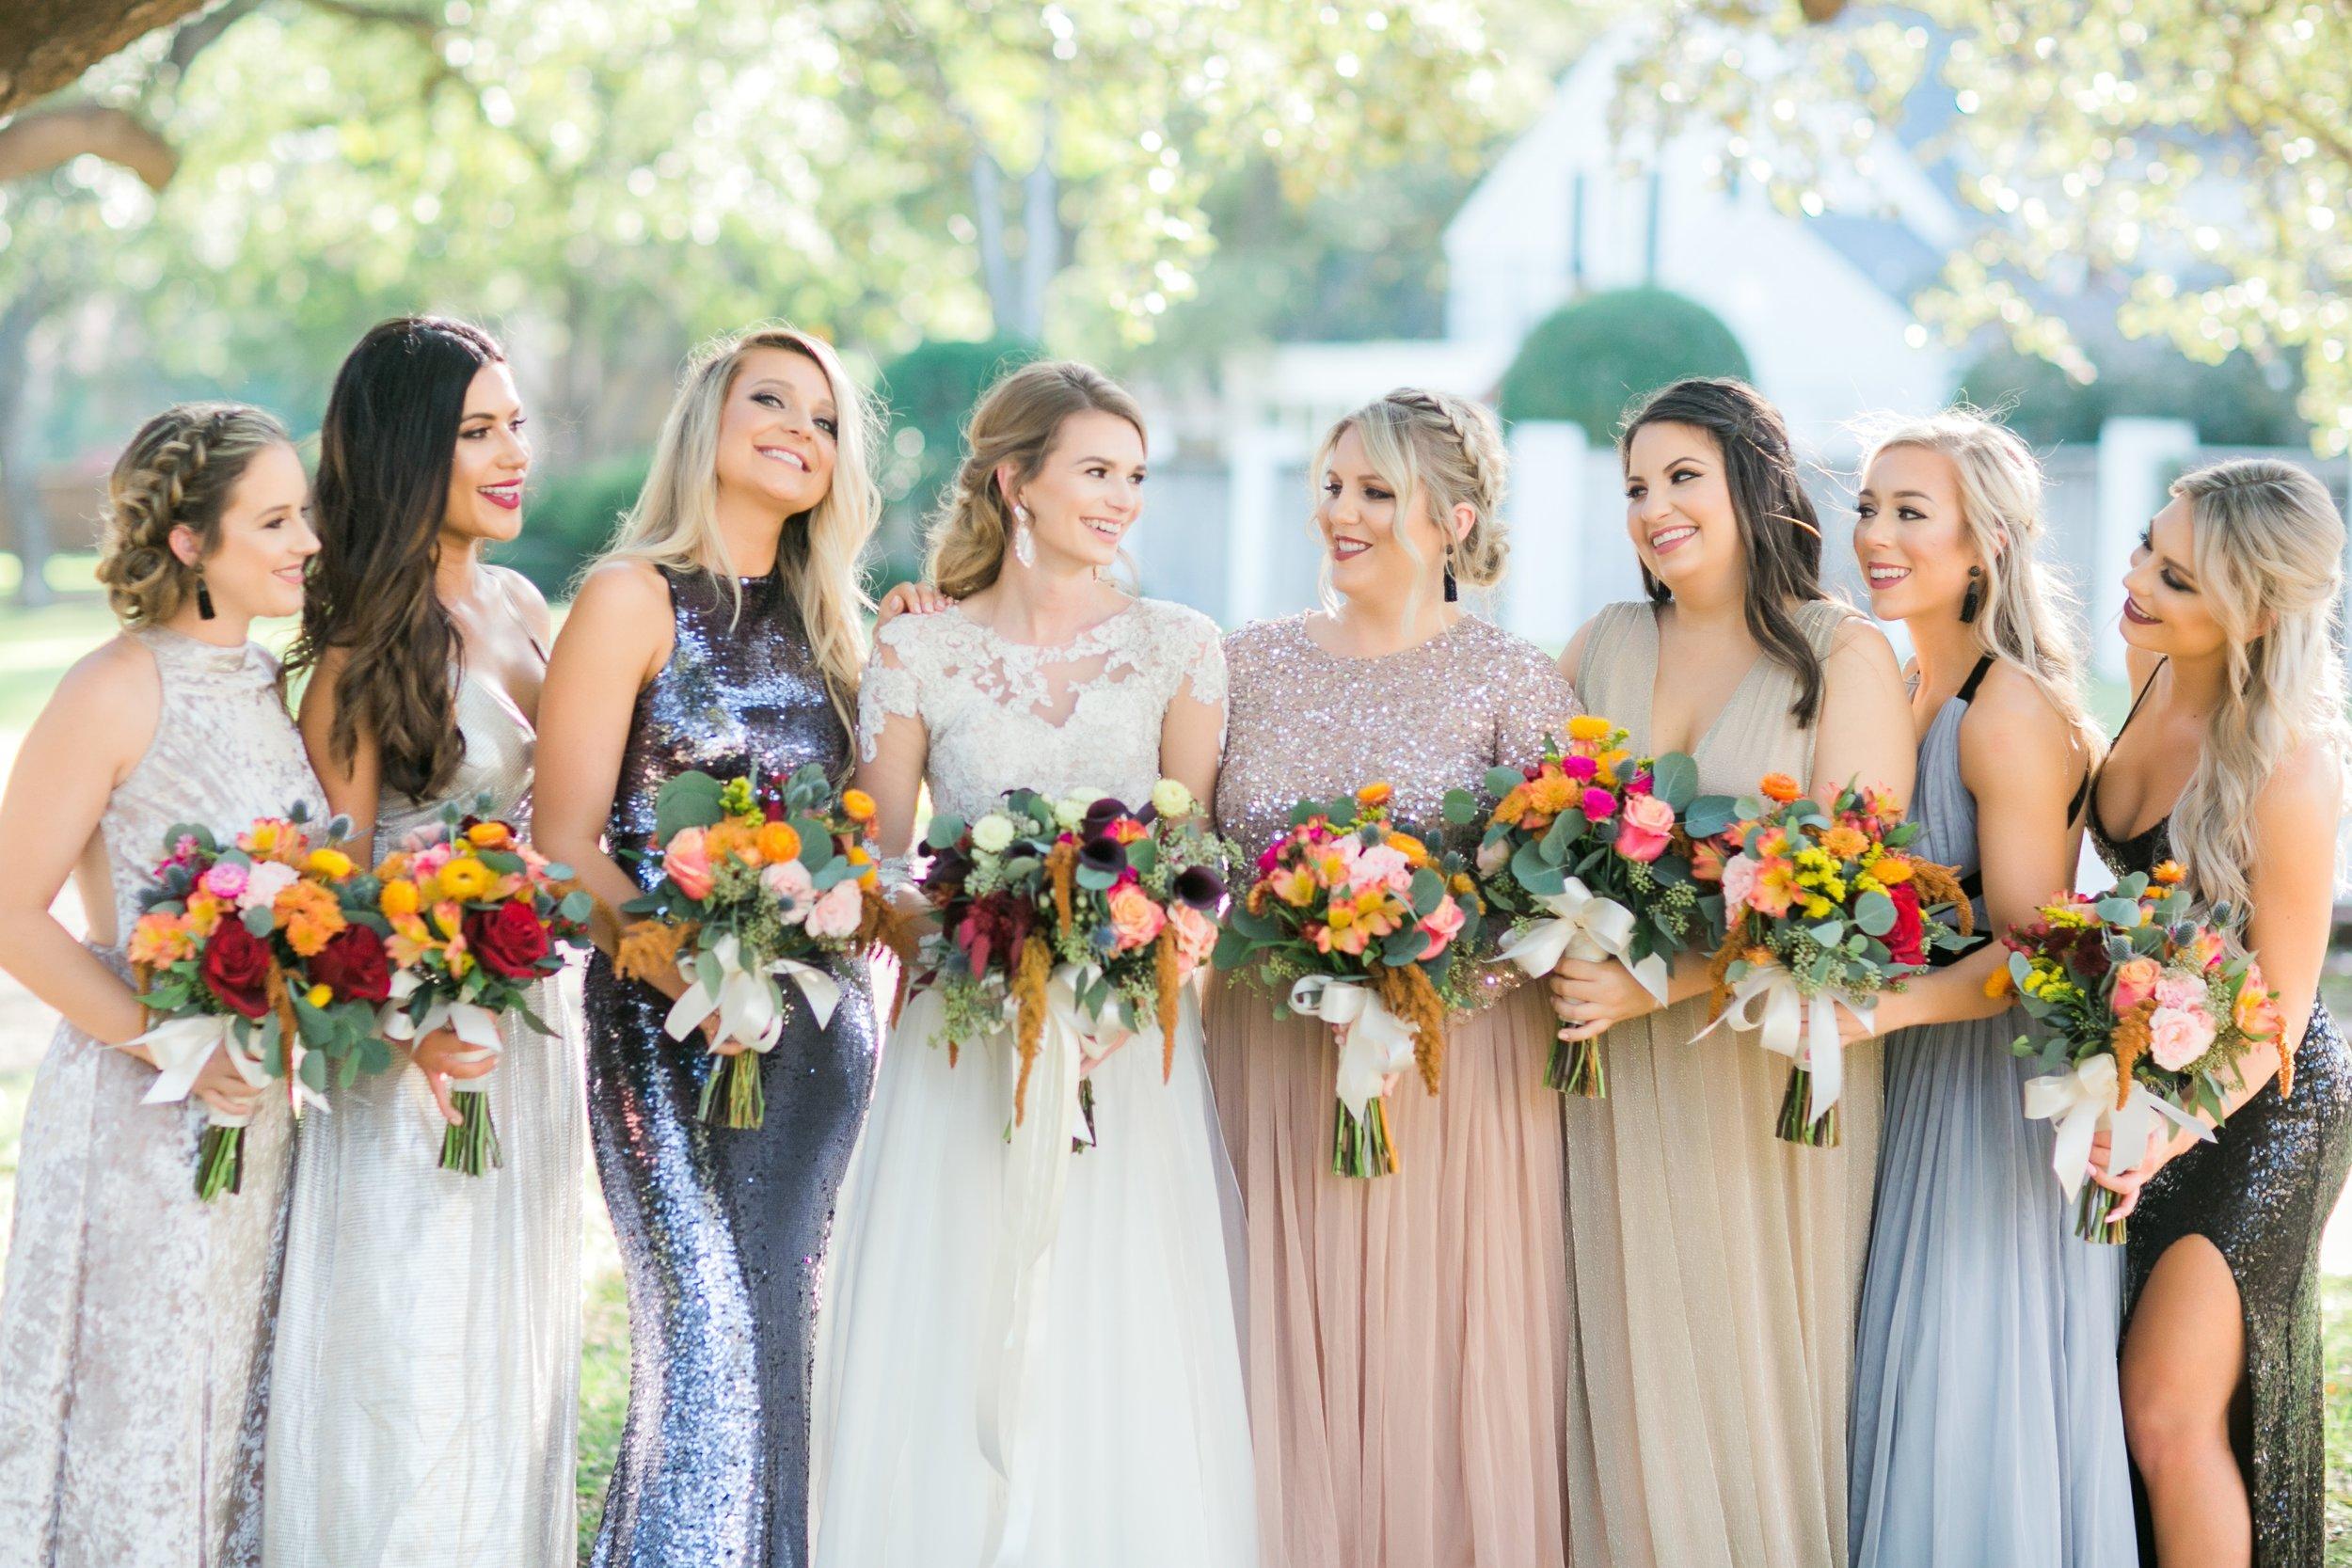 Roberson-Wedding-The-Forum-Lauren-Pinson-Wedding-Photography-Wichita-Falls-Texas-055.jpg